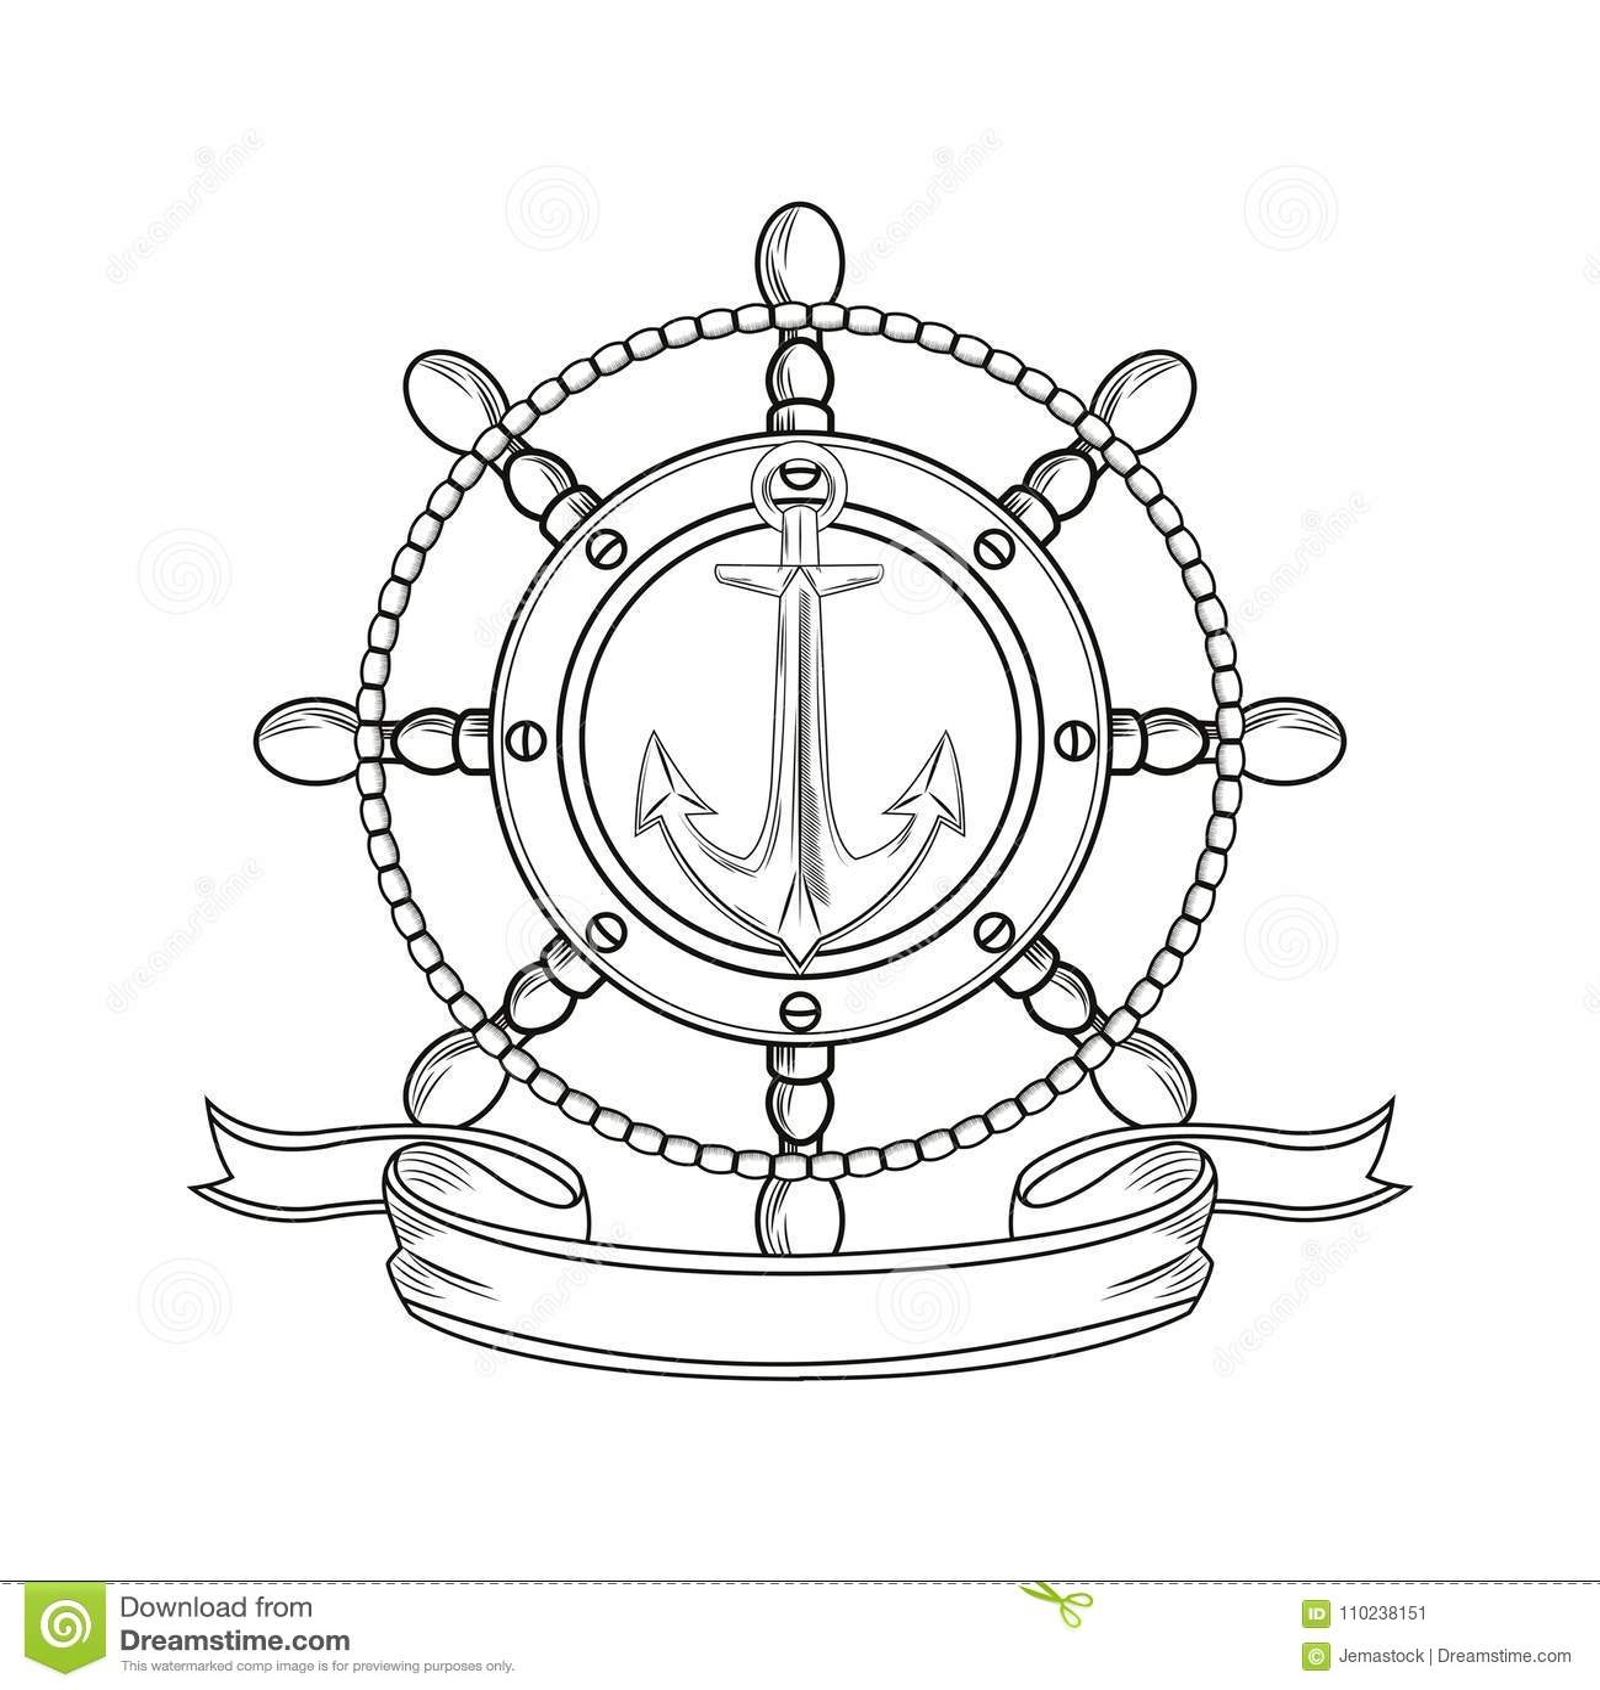 92a1e263d Rudder anchor ribbon cartoon pirate tattoo marine nautical icon. Black  white isolated design. Vector illustration. More similar stock illustrations